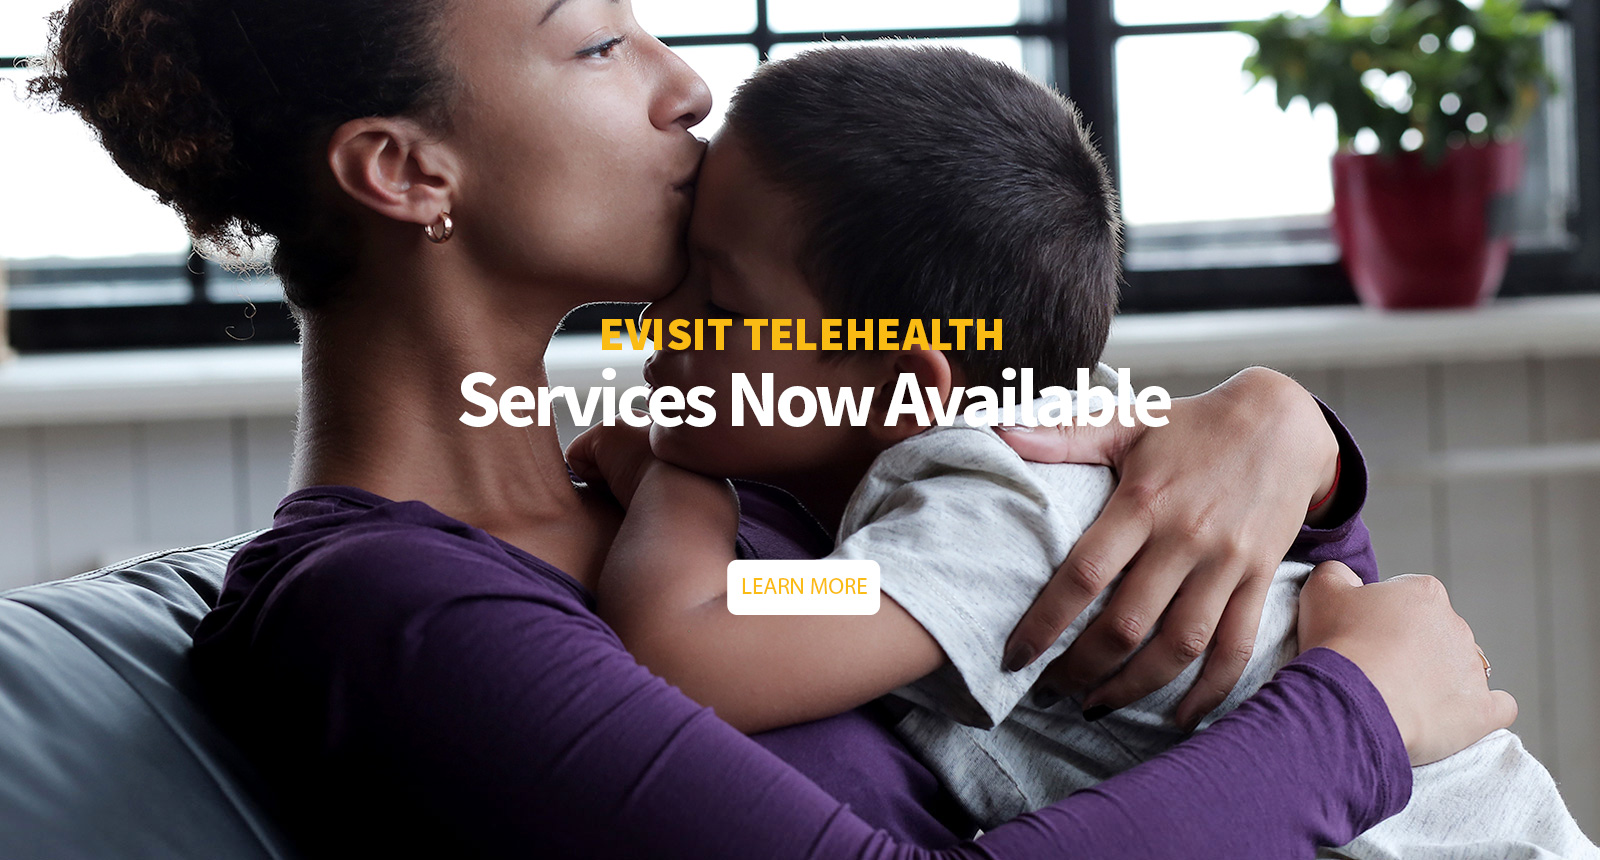 eVisit Telehealth Coming Soon